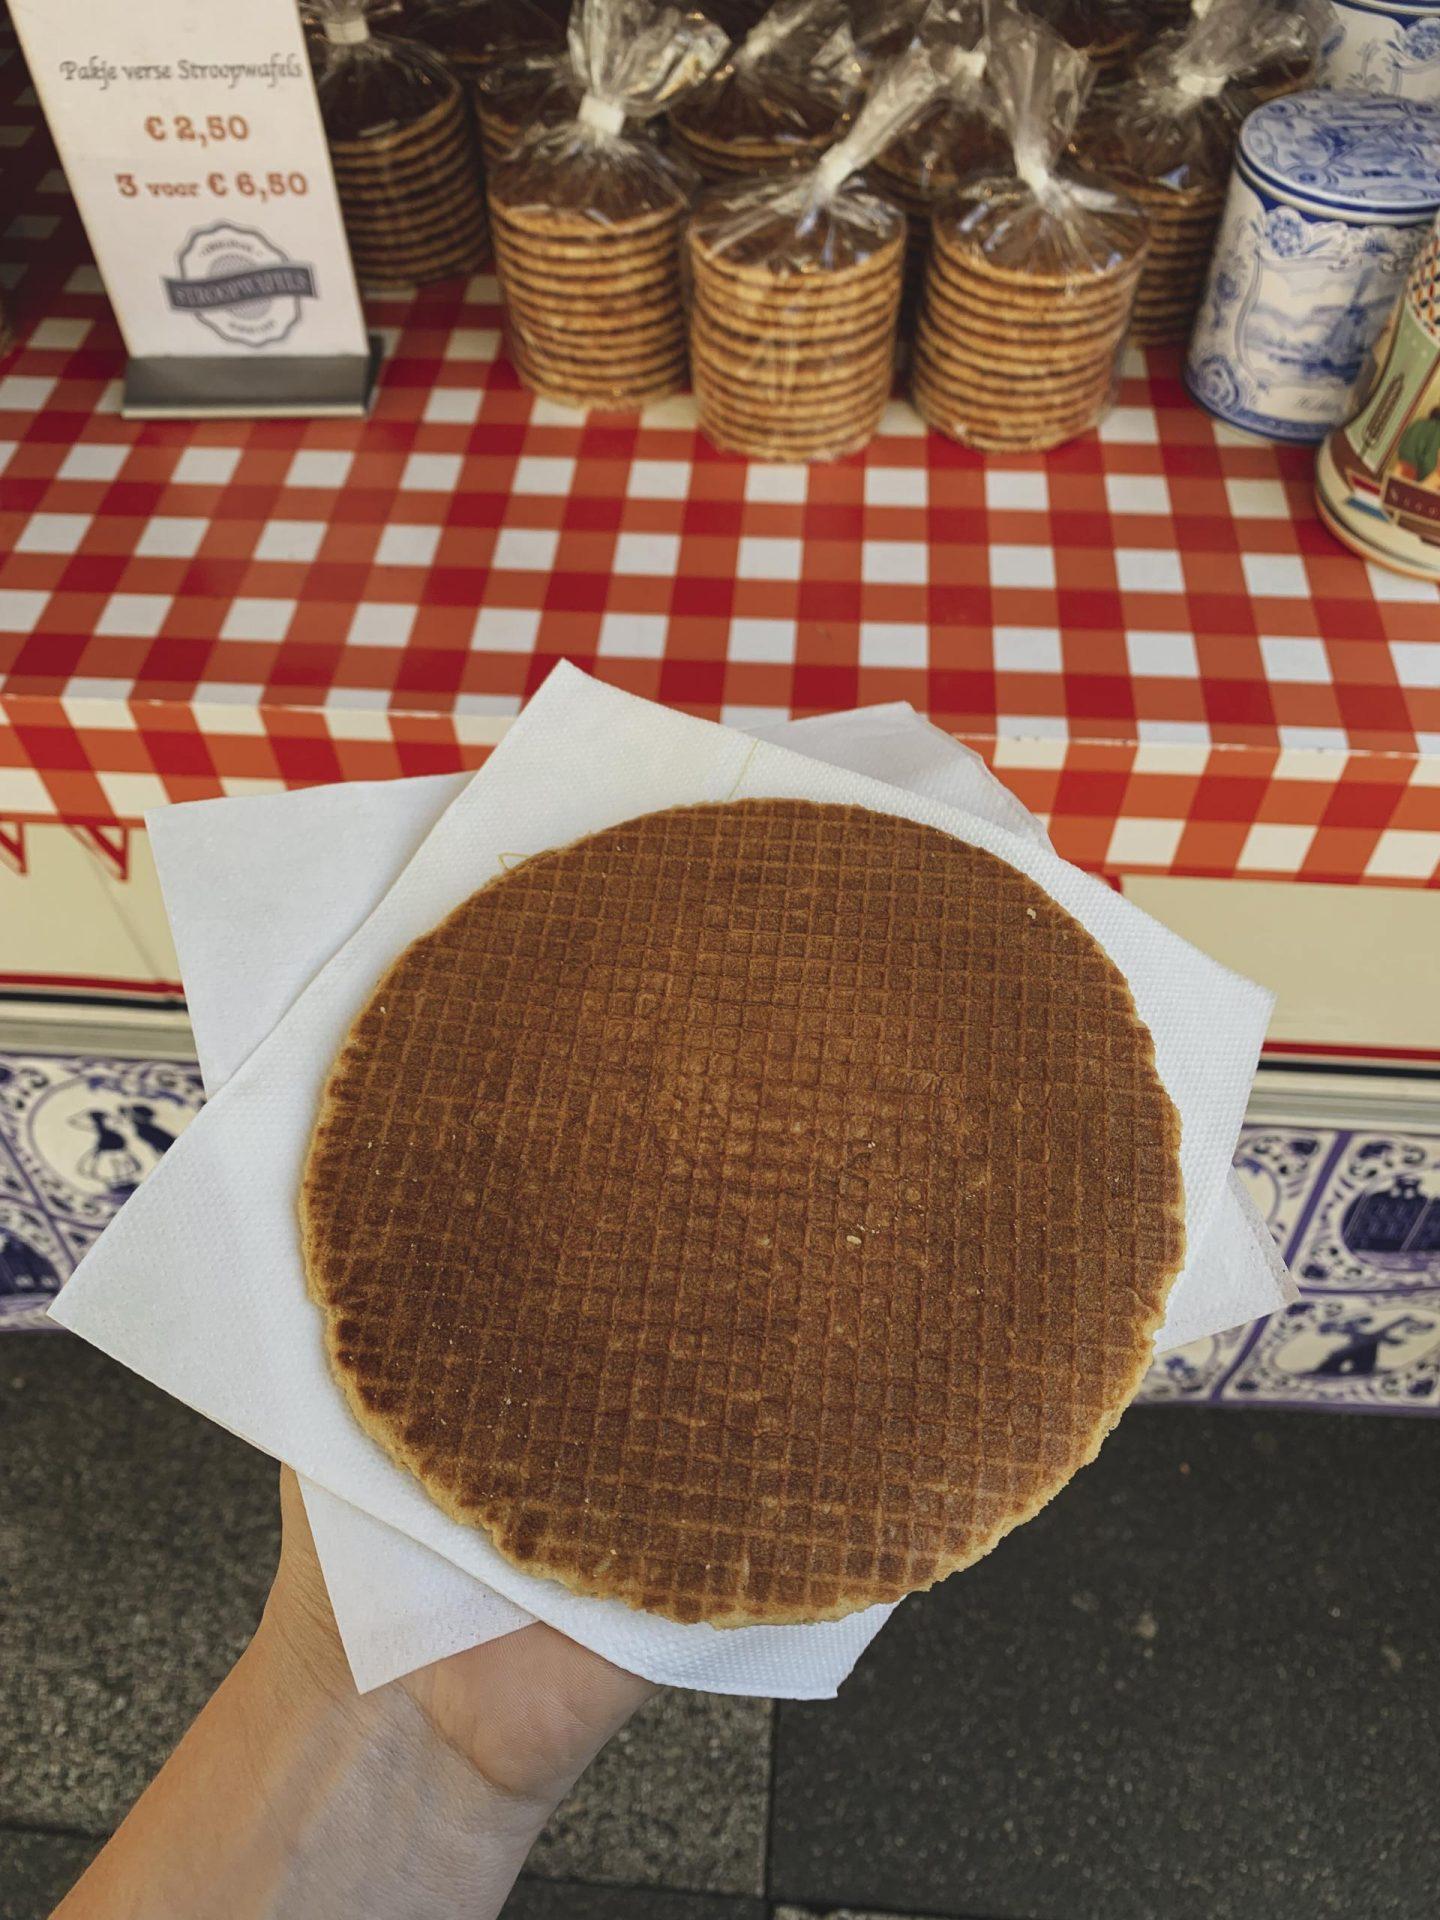 stroopwafel amsterdam